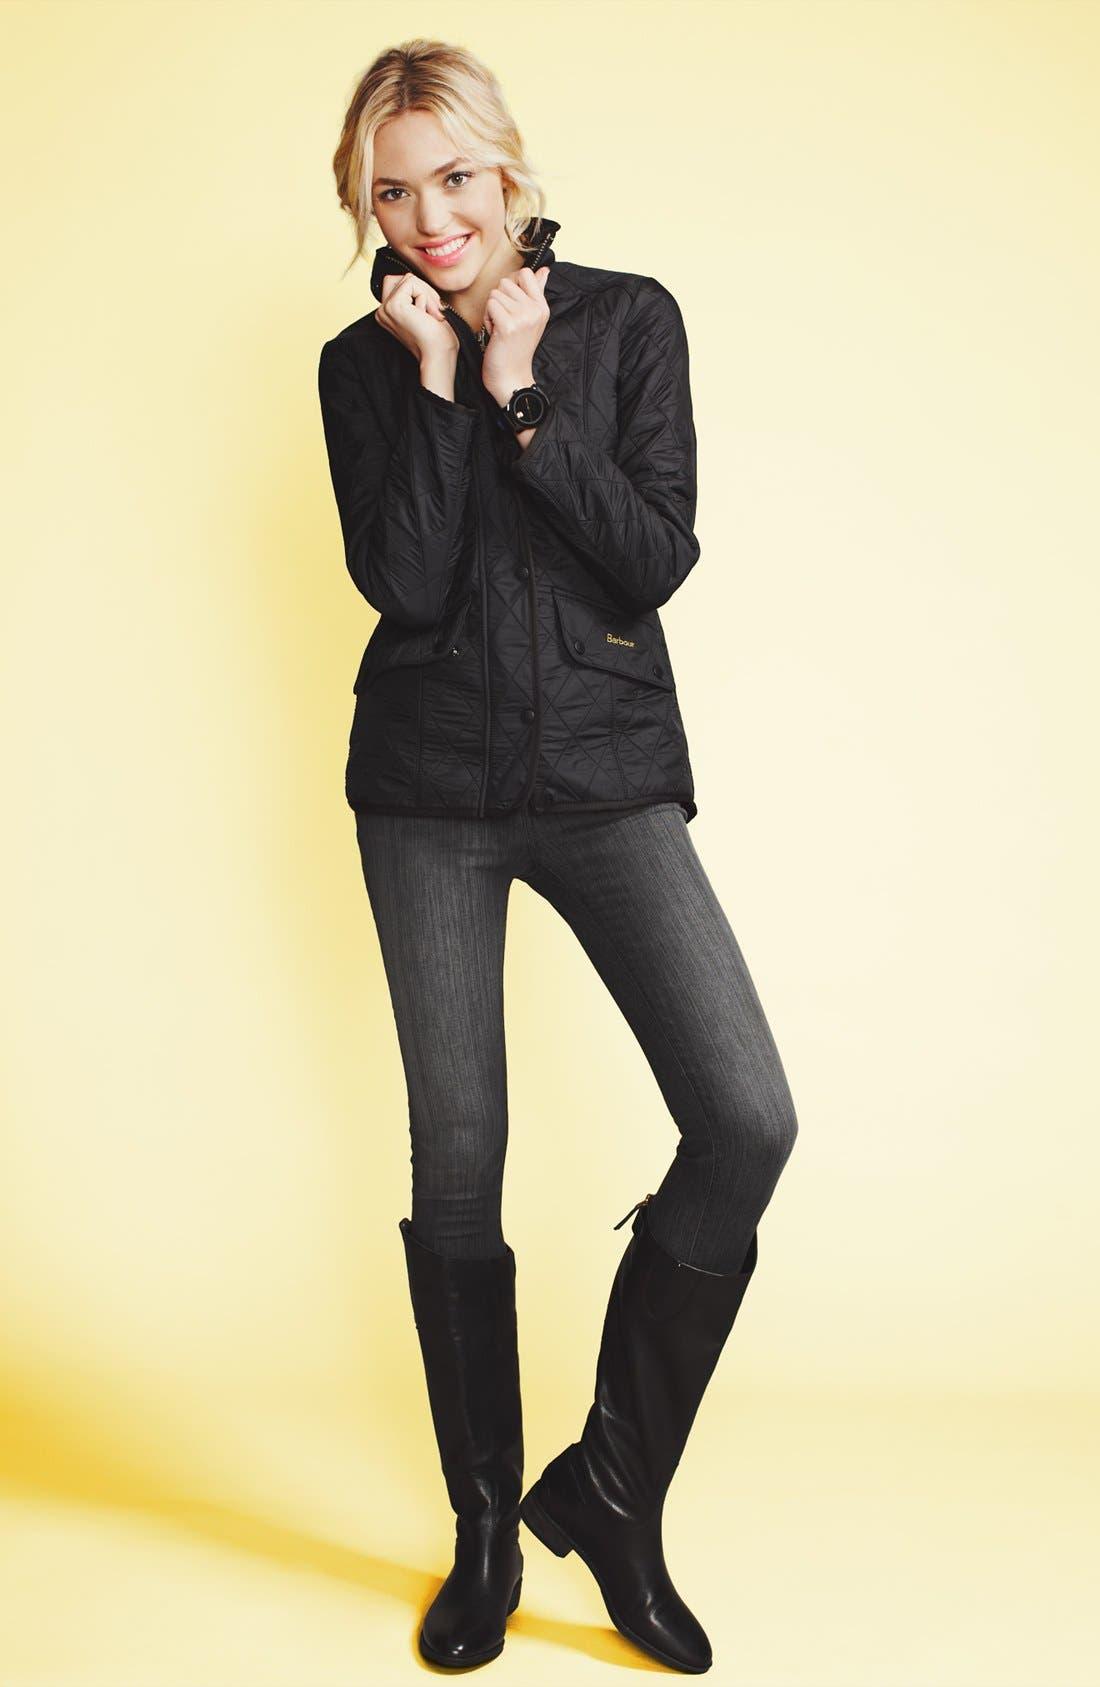 Main Image - Barbour 'Calvary' Jacket, Burberry Brit Jeans & Sam Edelman Boots